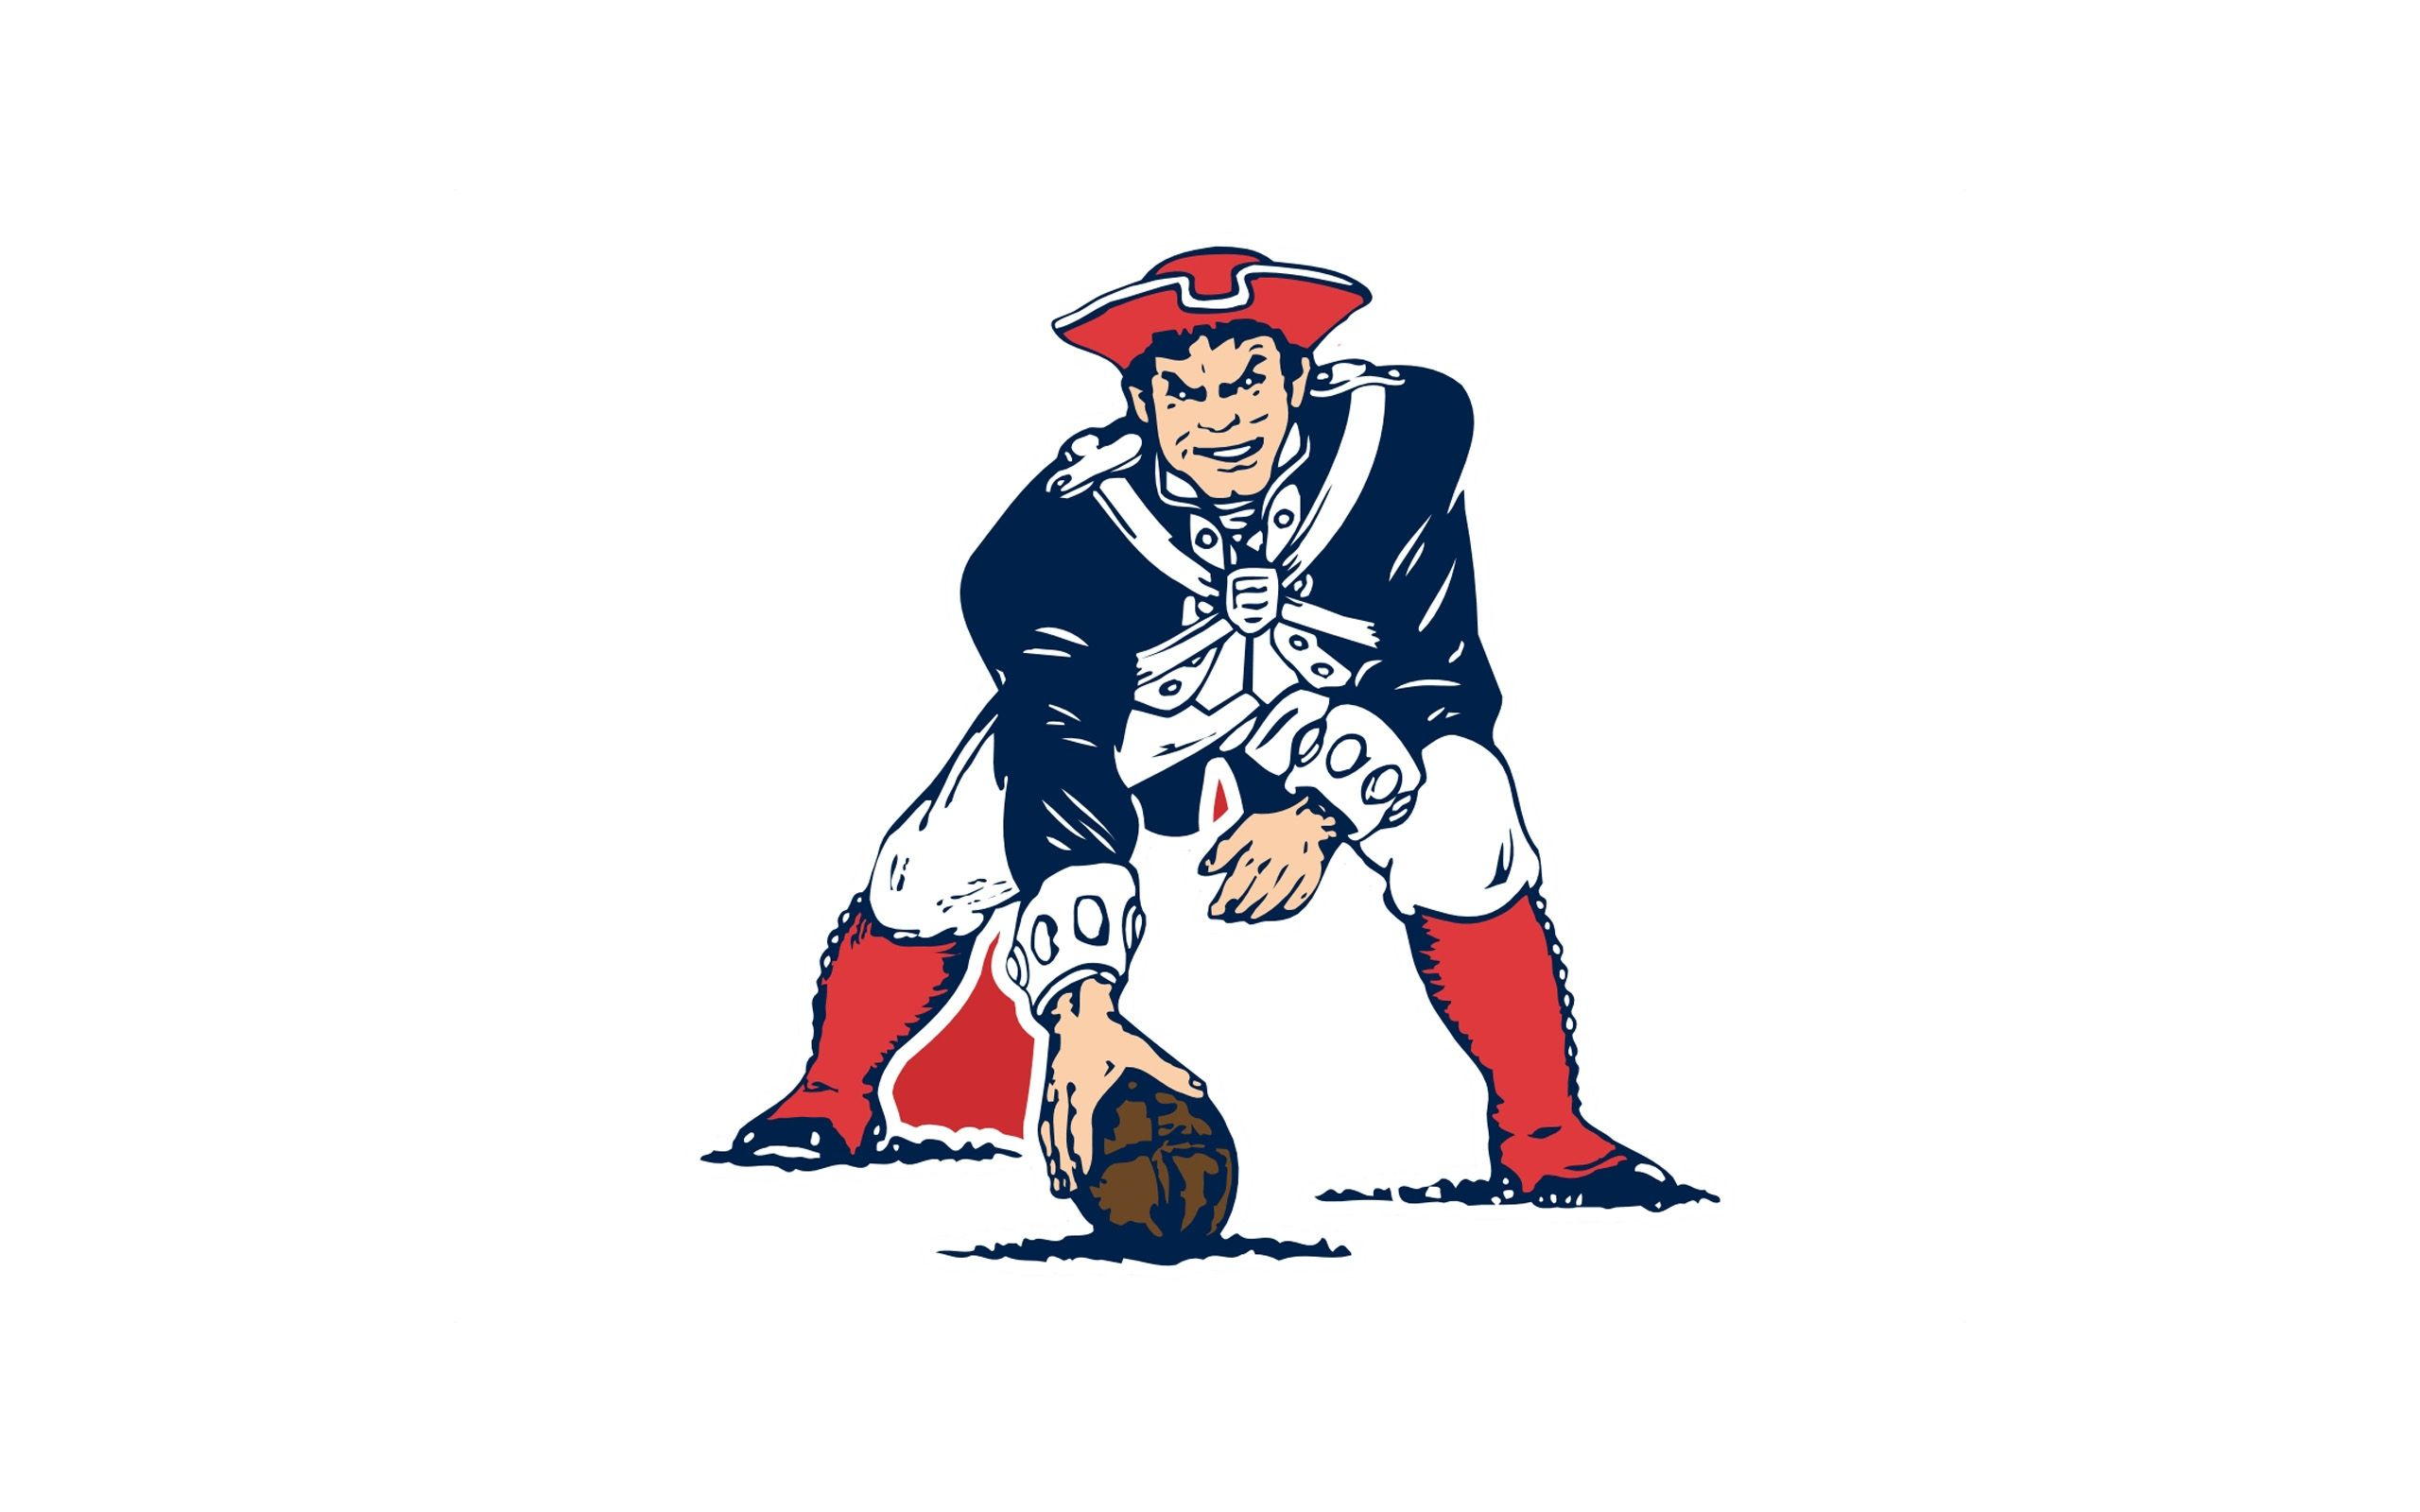 Old New England Patriots Logo Jpg 2560 1600 New England Patriots Logo New England Patriots Patriots Logo